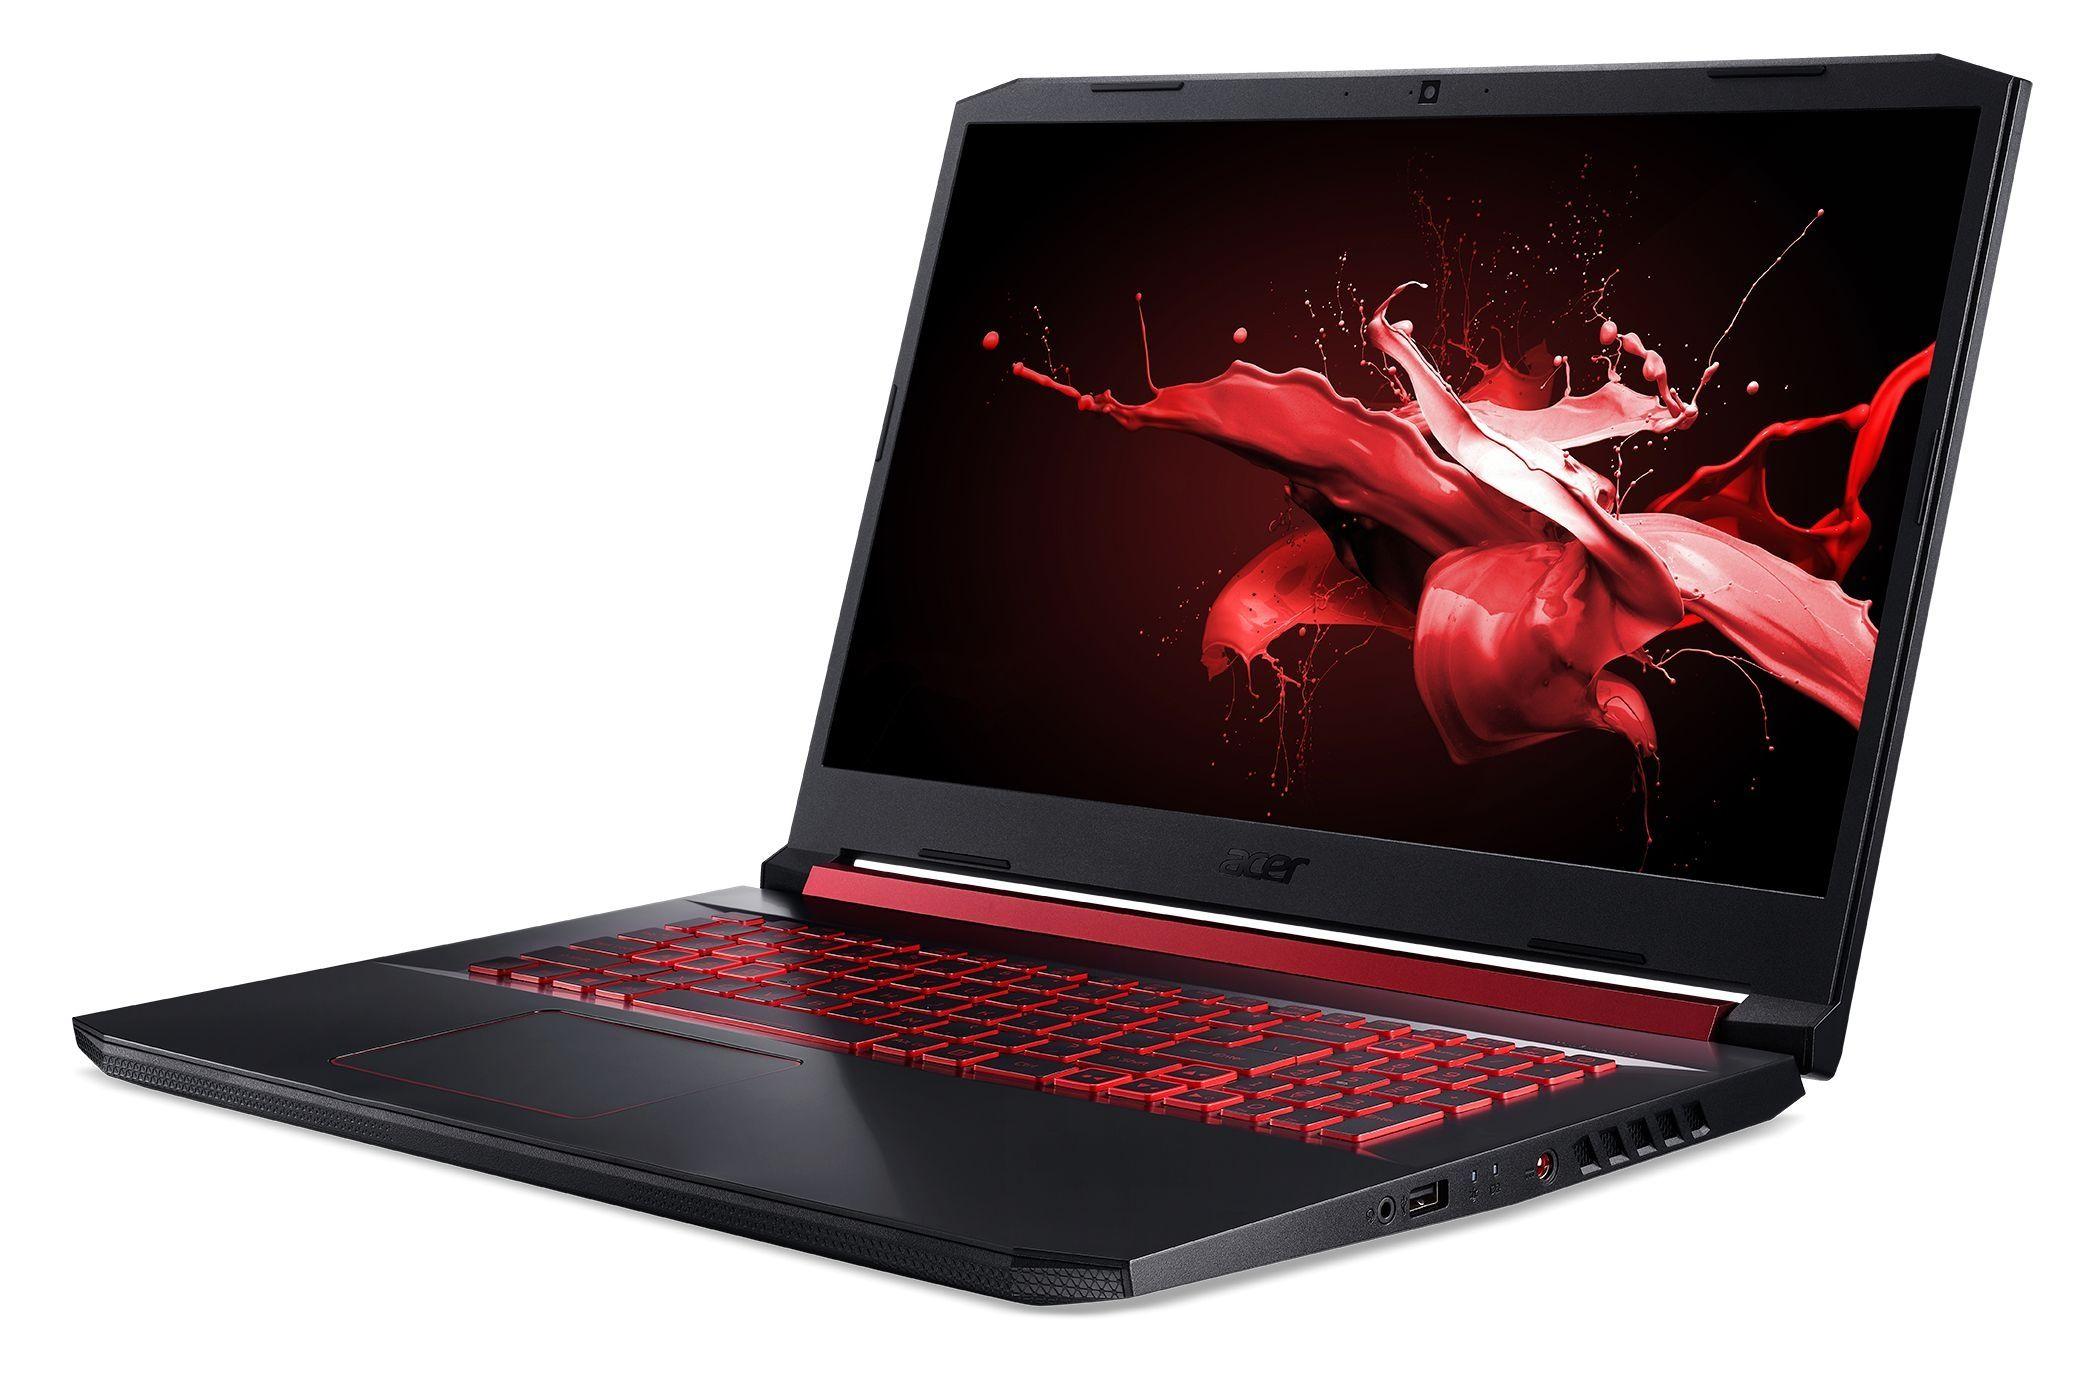 "Геймърски лаптоп Acer Nitro 5 - AN517-51-51KD,17.3"", FHD, черен - 3"